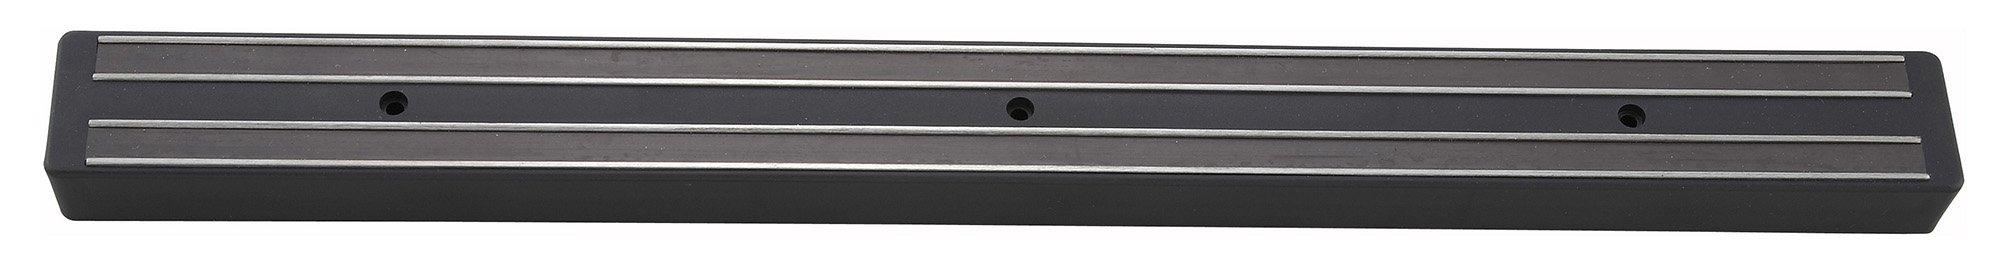 24 Magnetic Knife Holder, Plastic Base